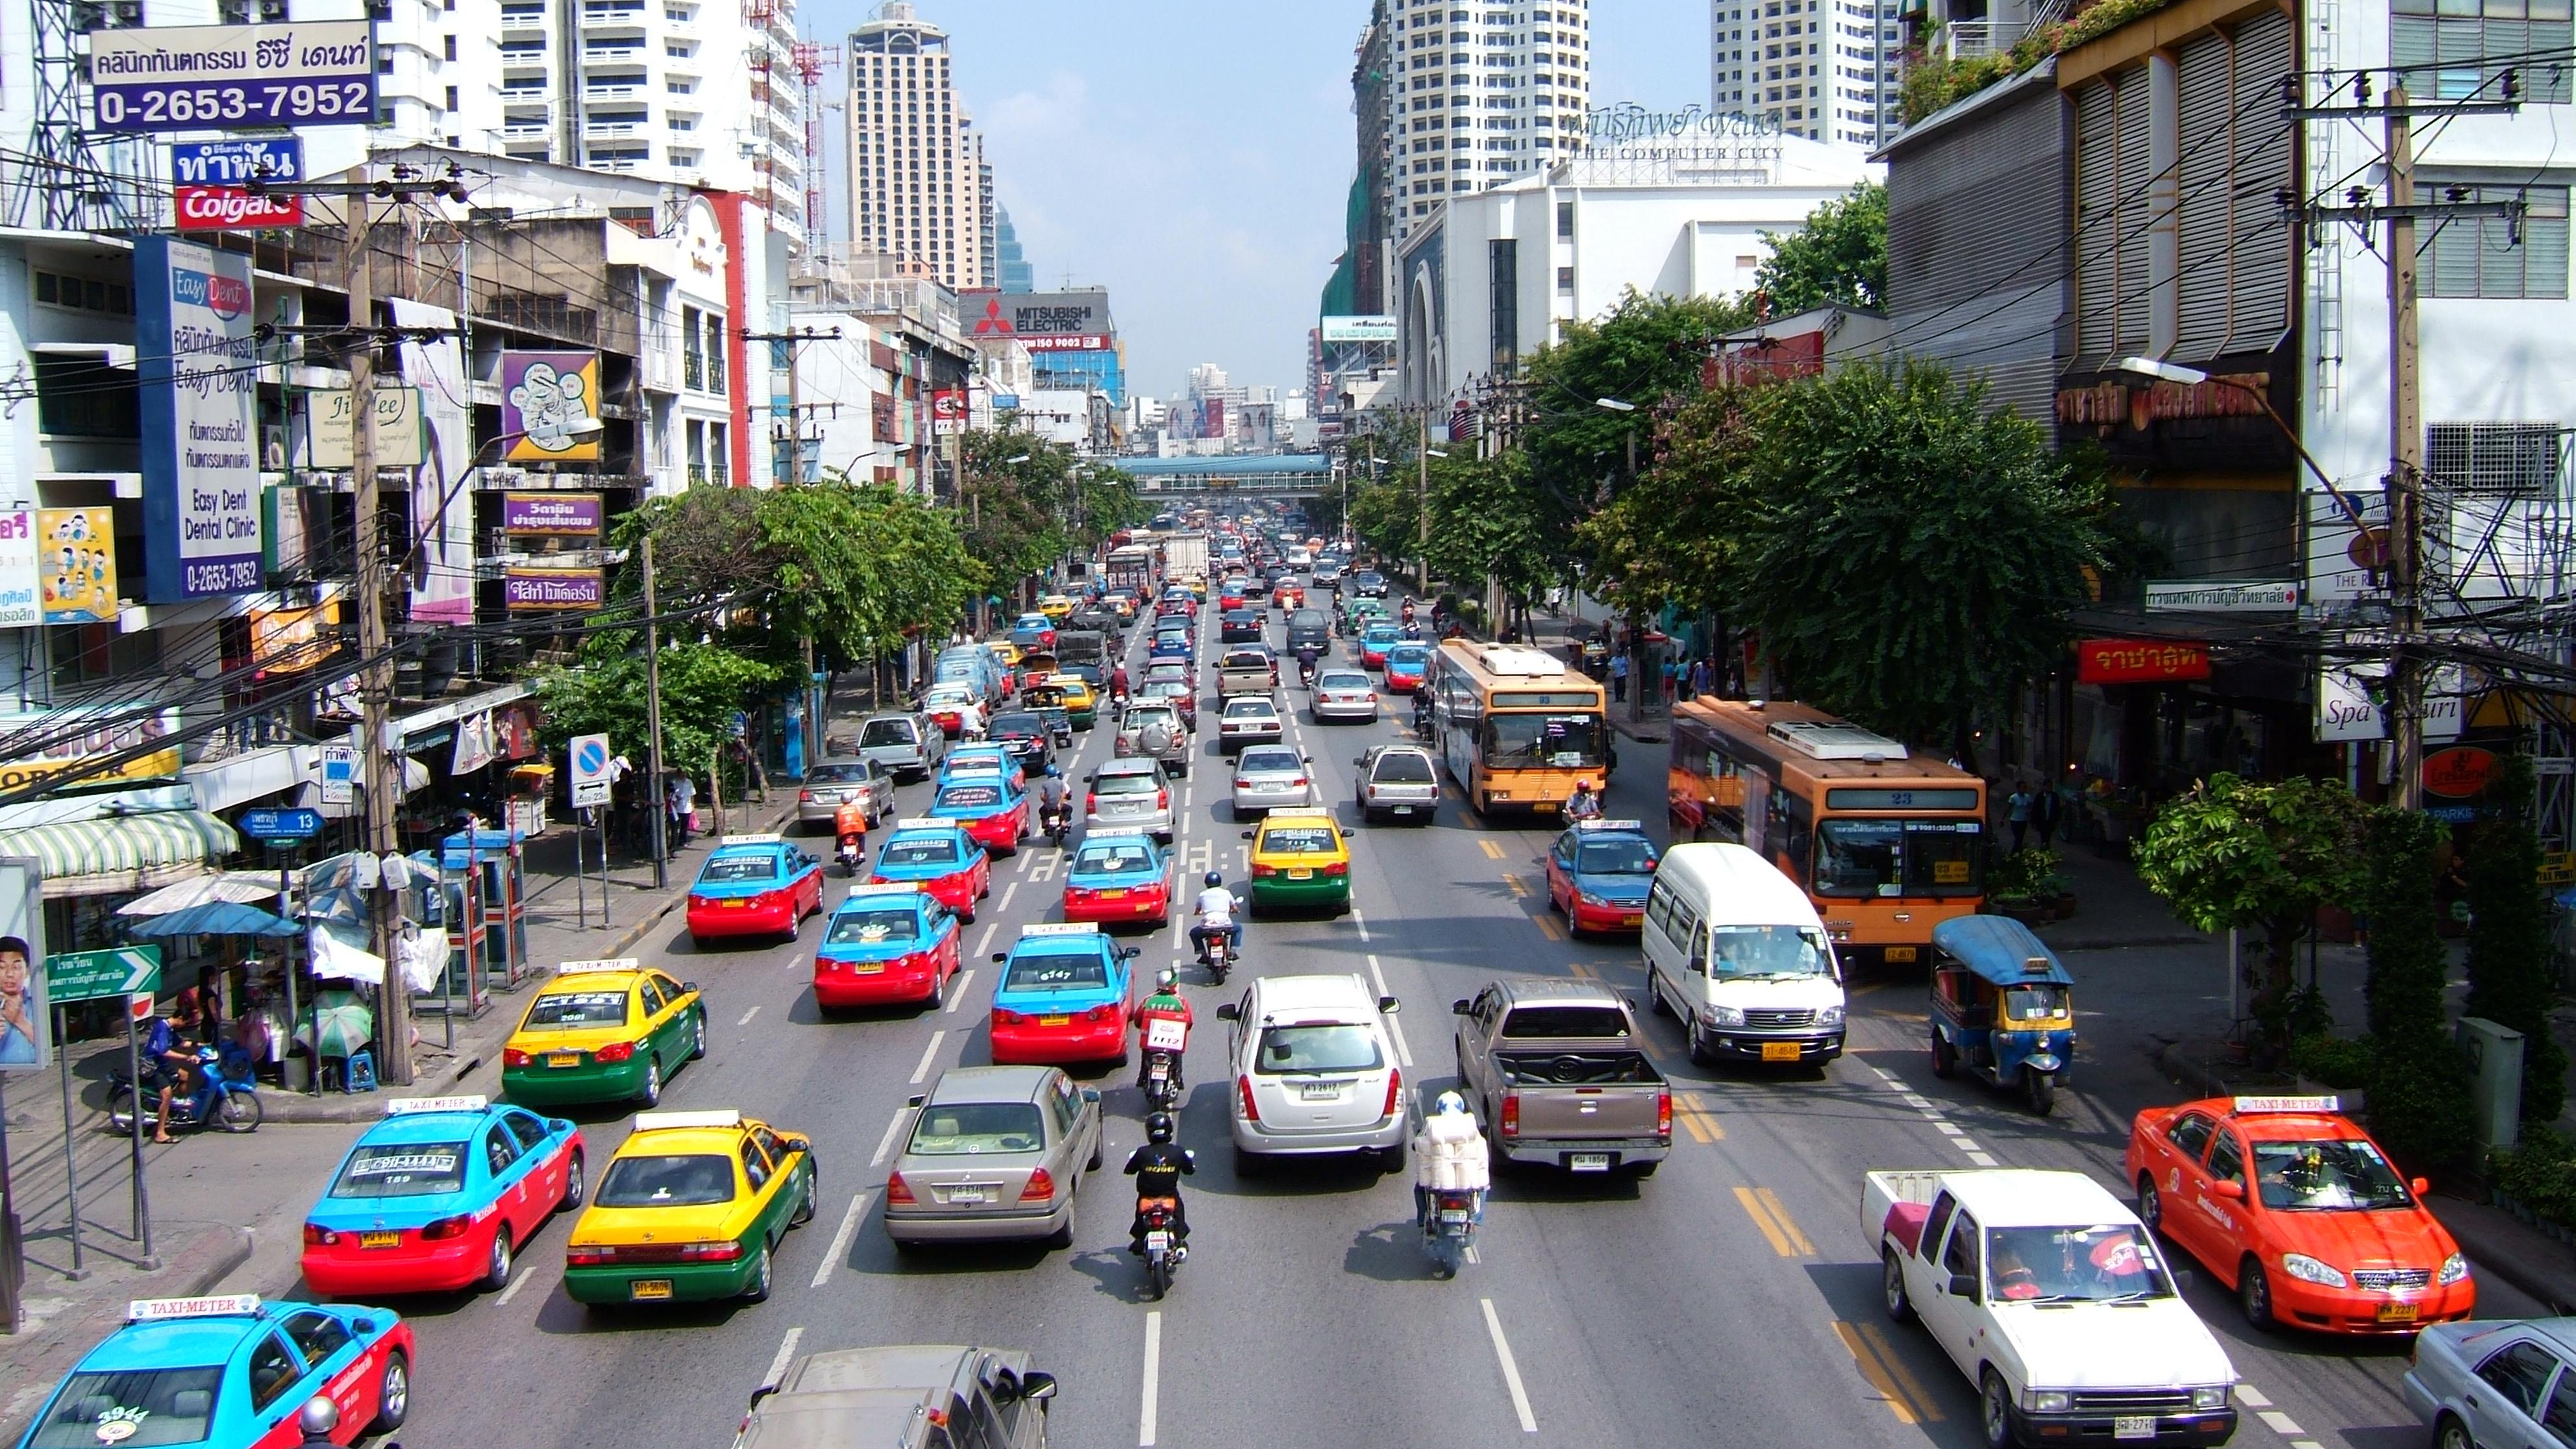 Bangkok Traffic street scenes Thailand Oct 2005 01